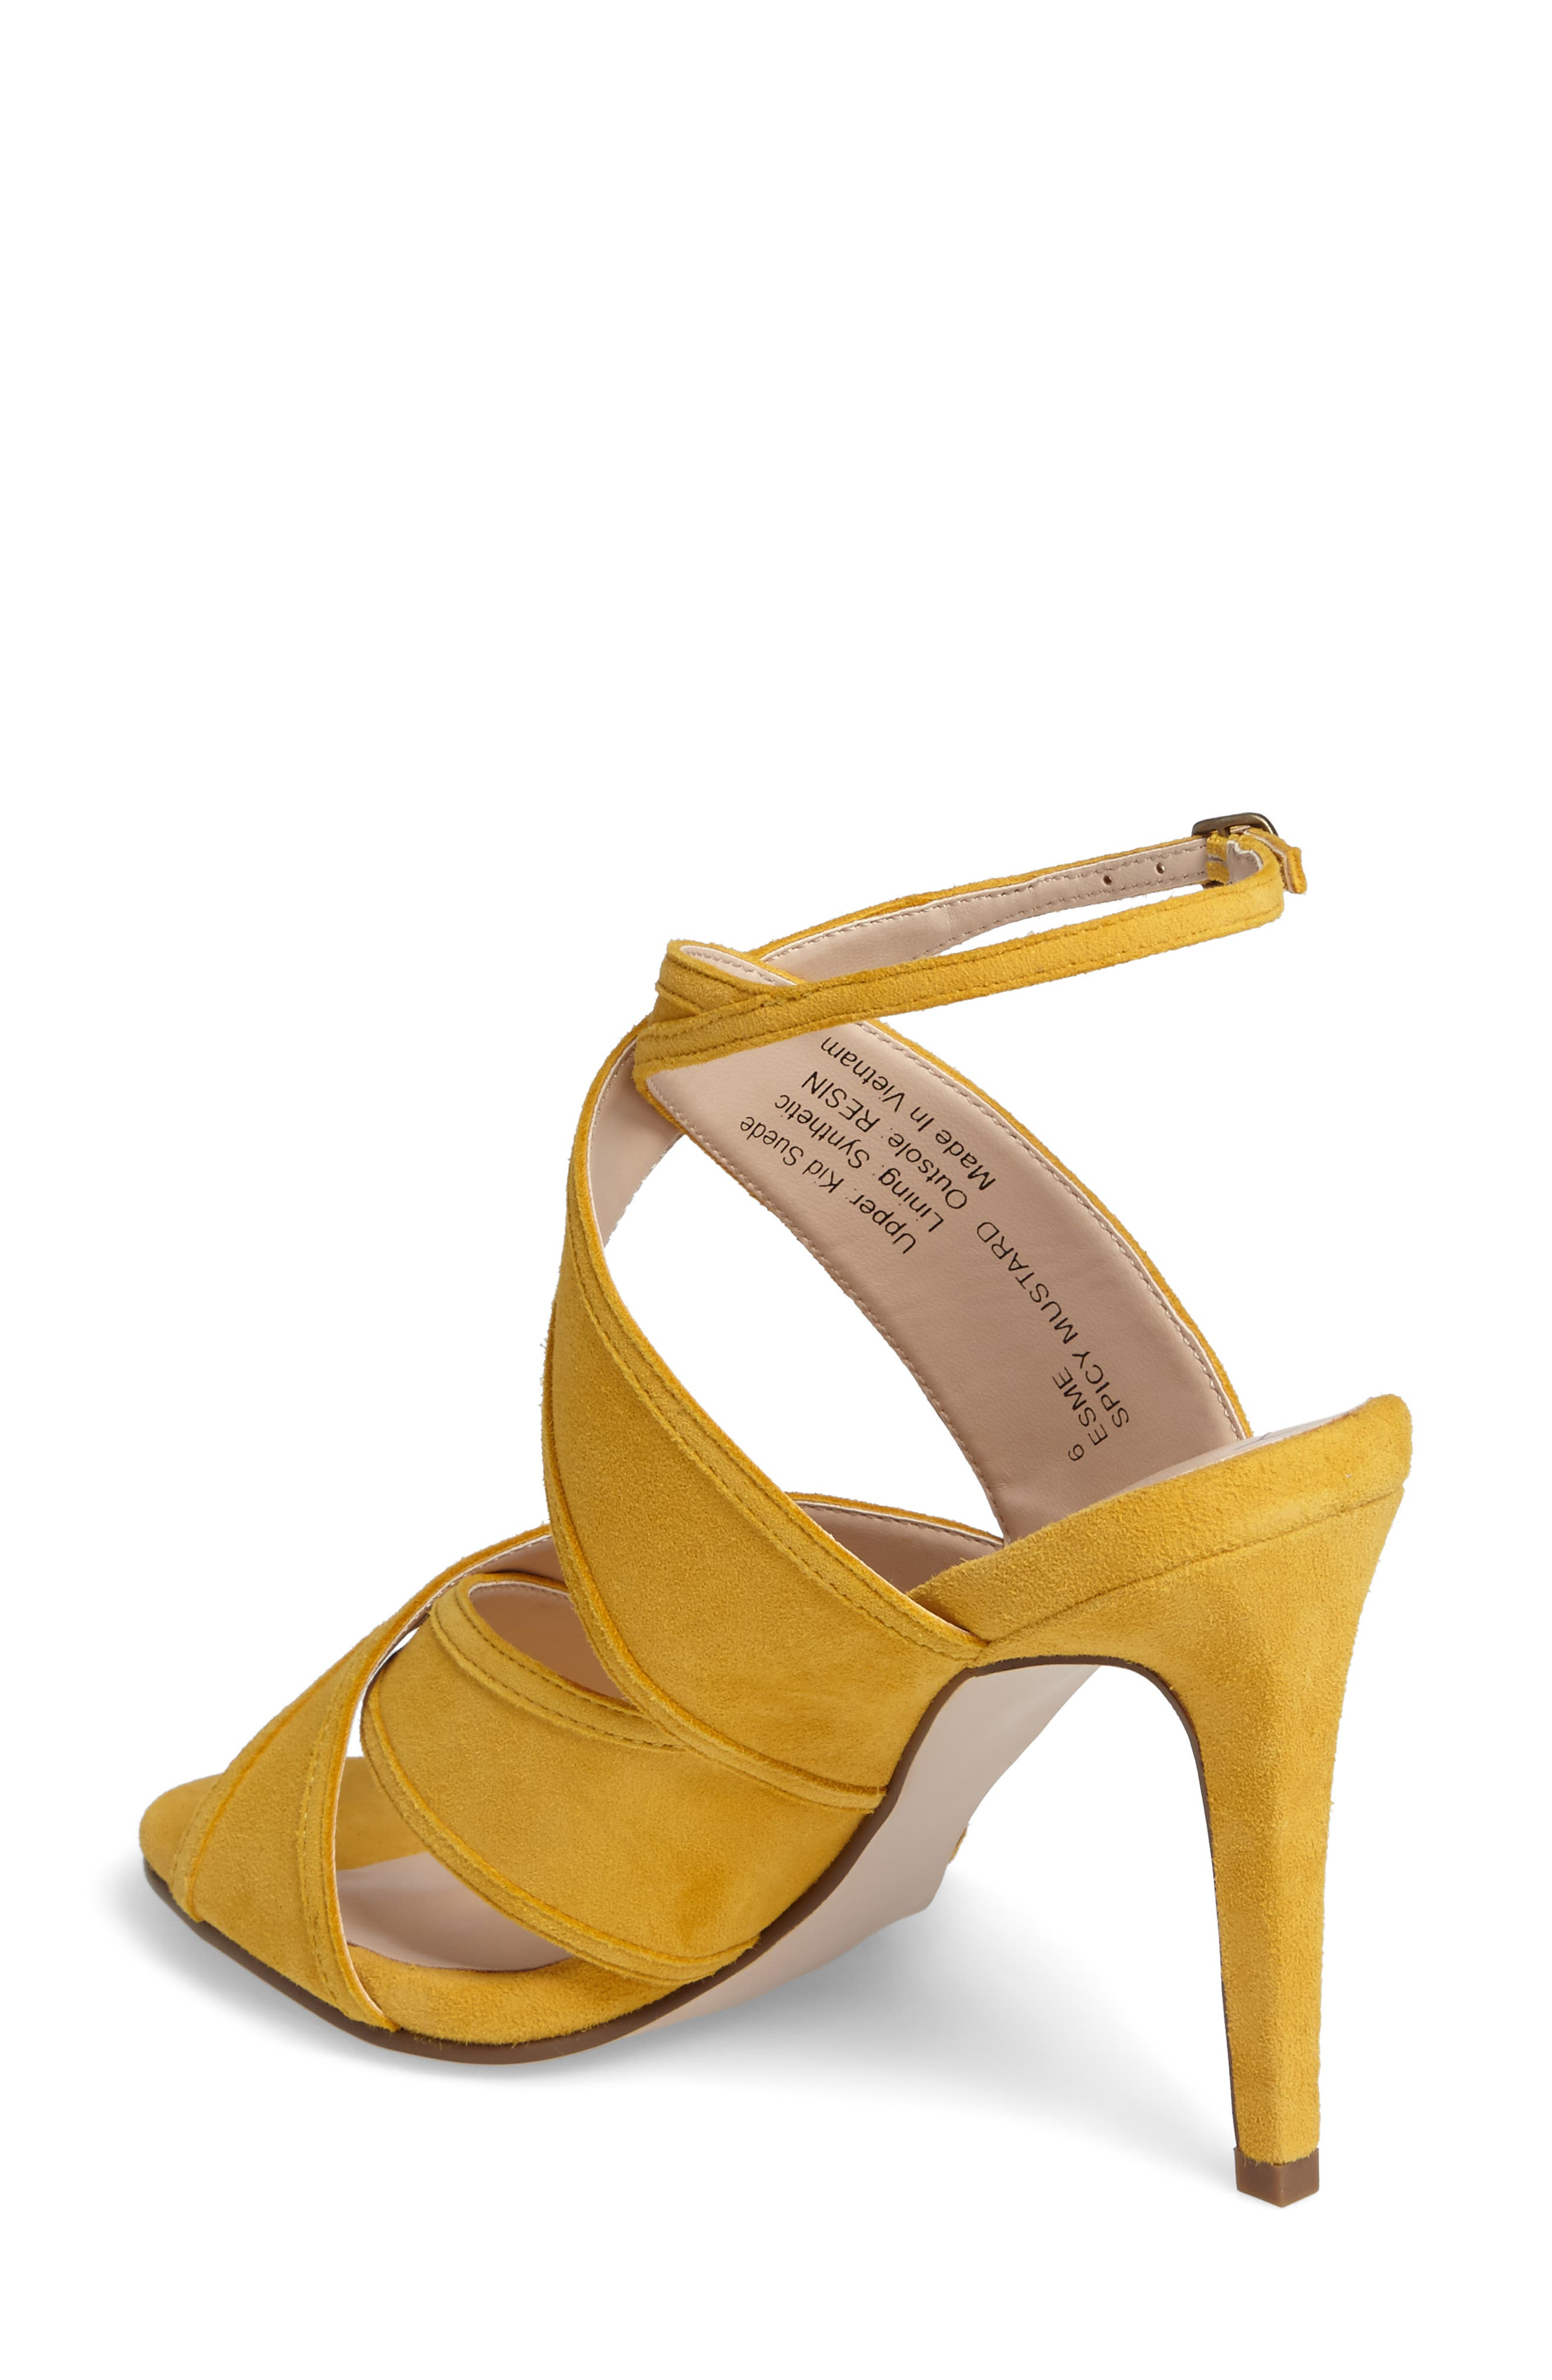 Esme Cross Strap Sandal,                             Alternate thumbnail 2, color,                             Spicy Mustard Suede